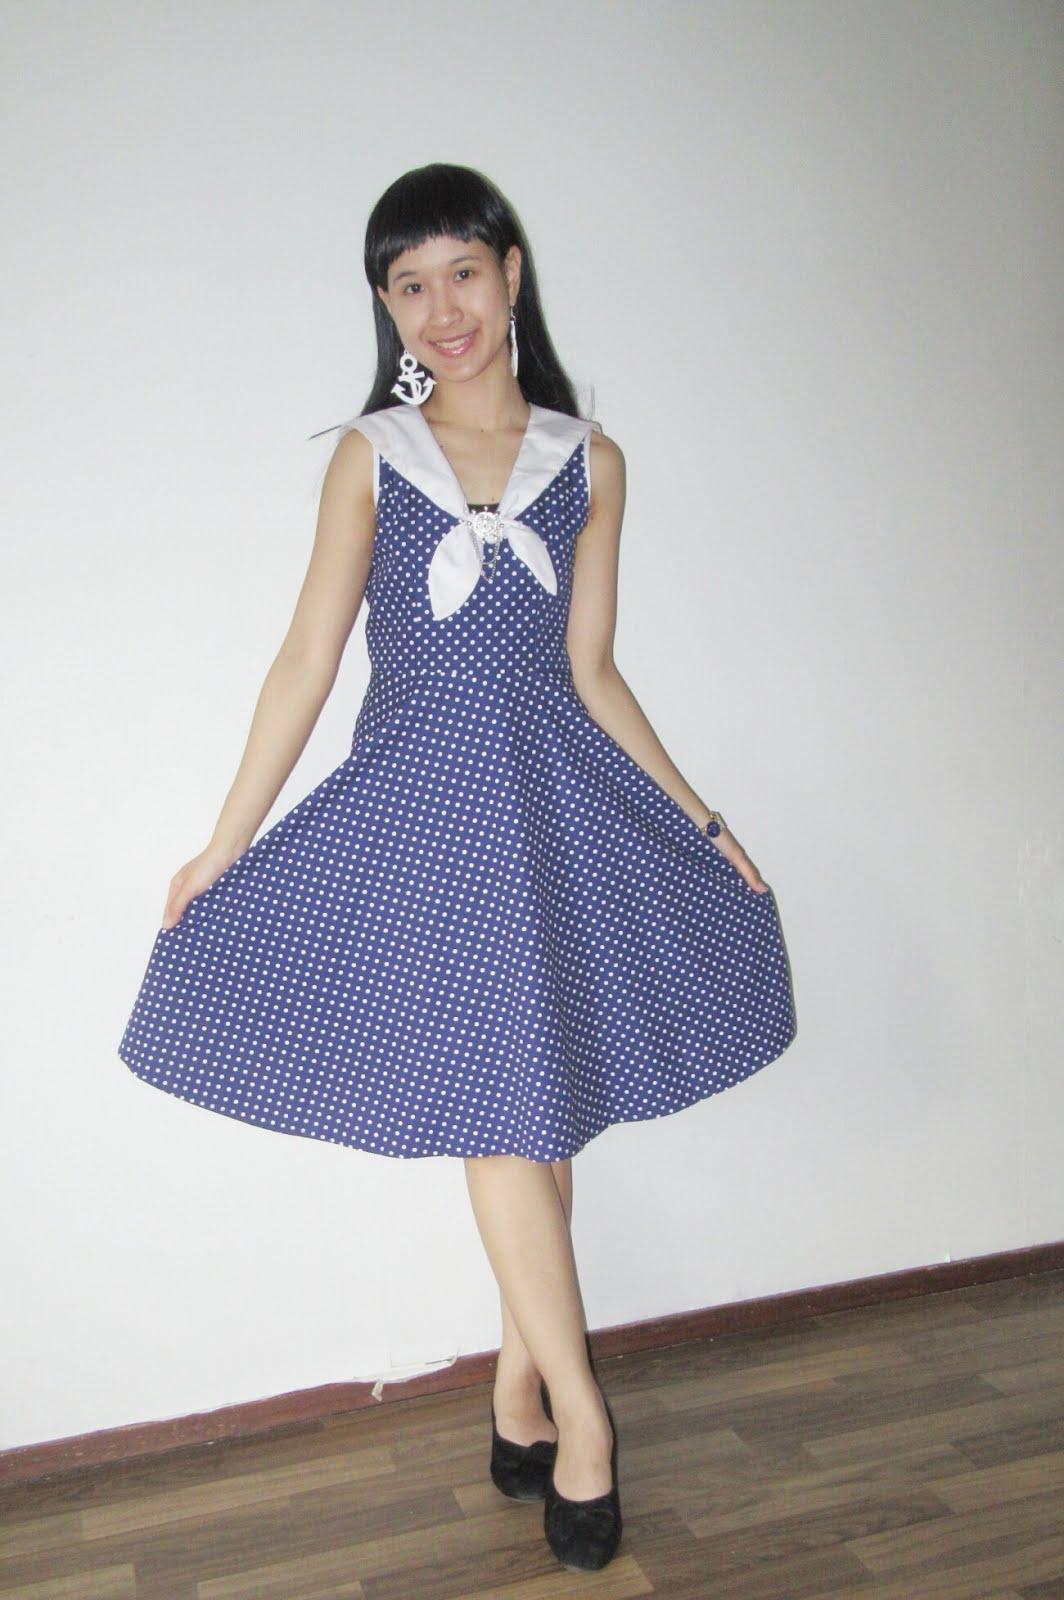 Miss Pimlada